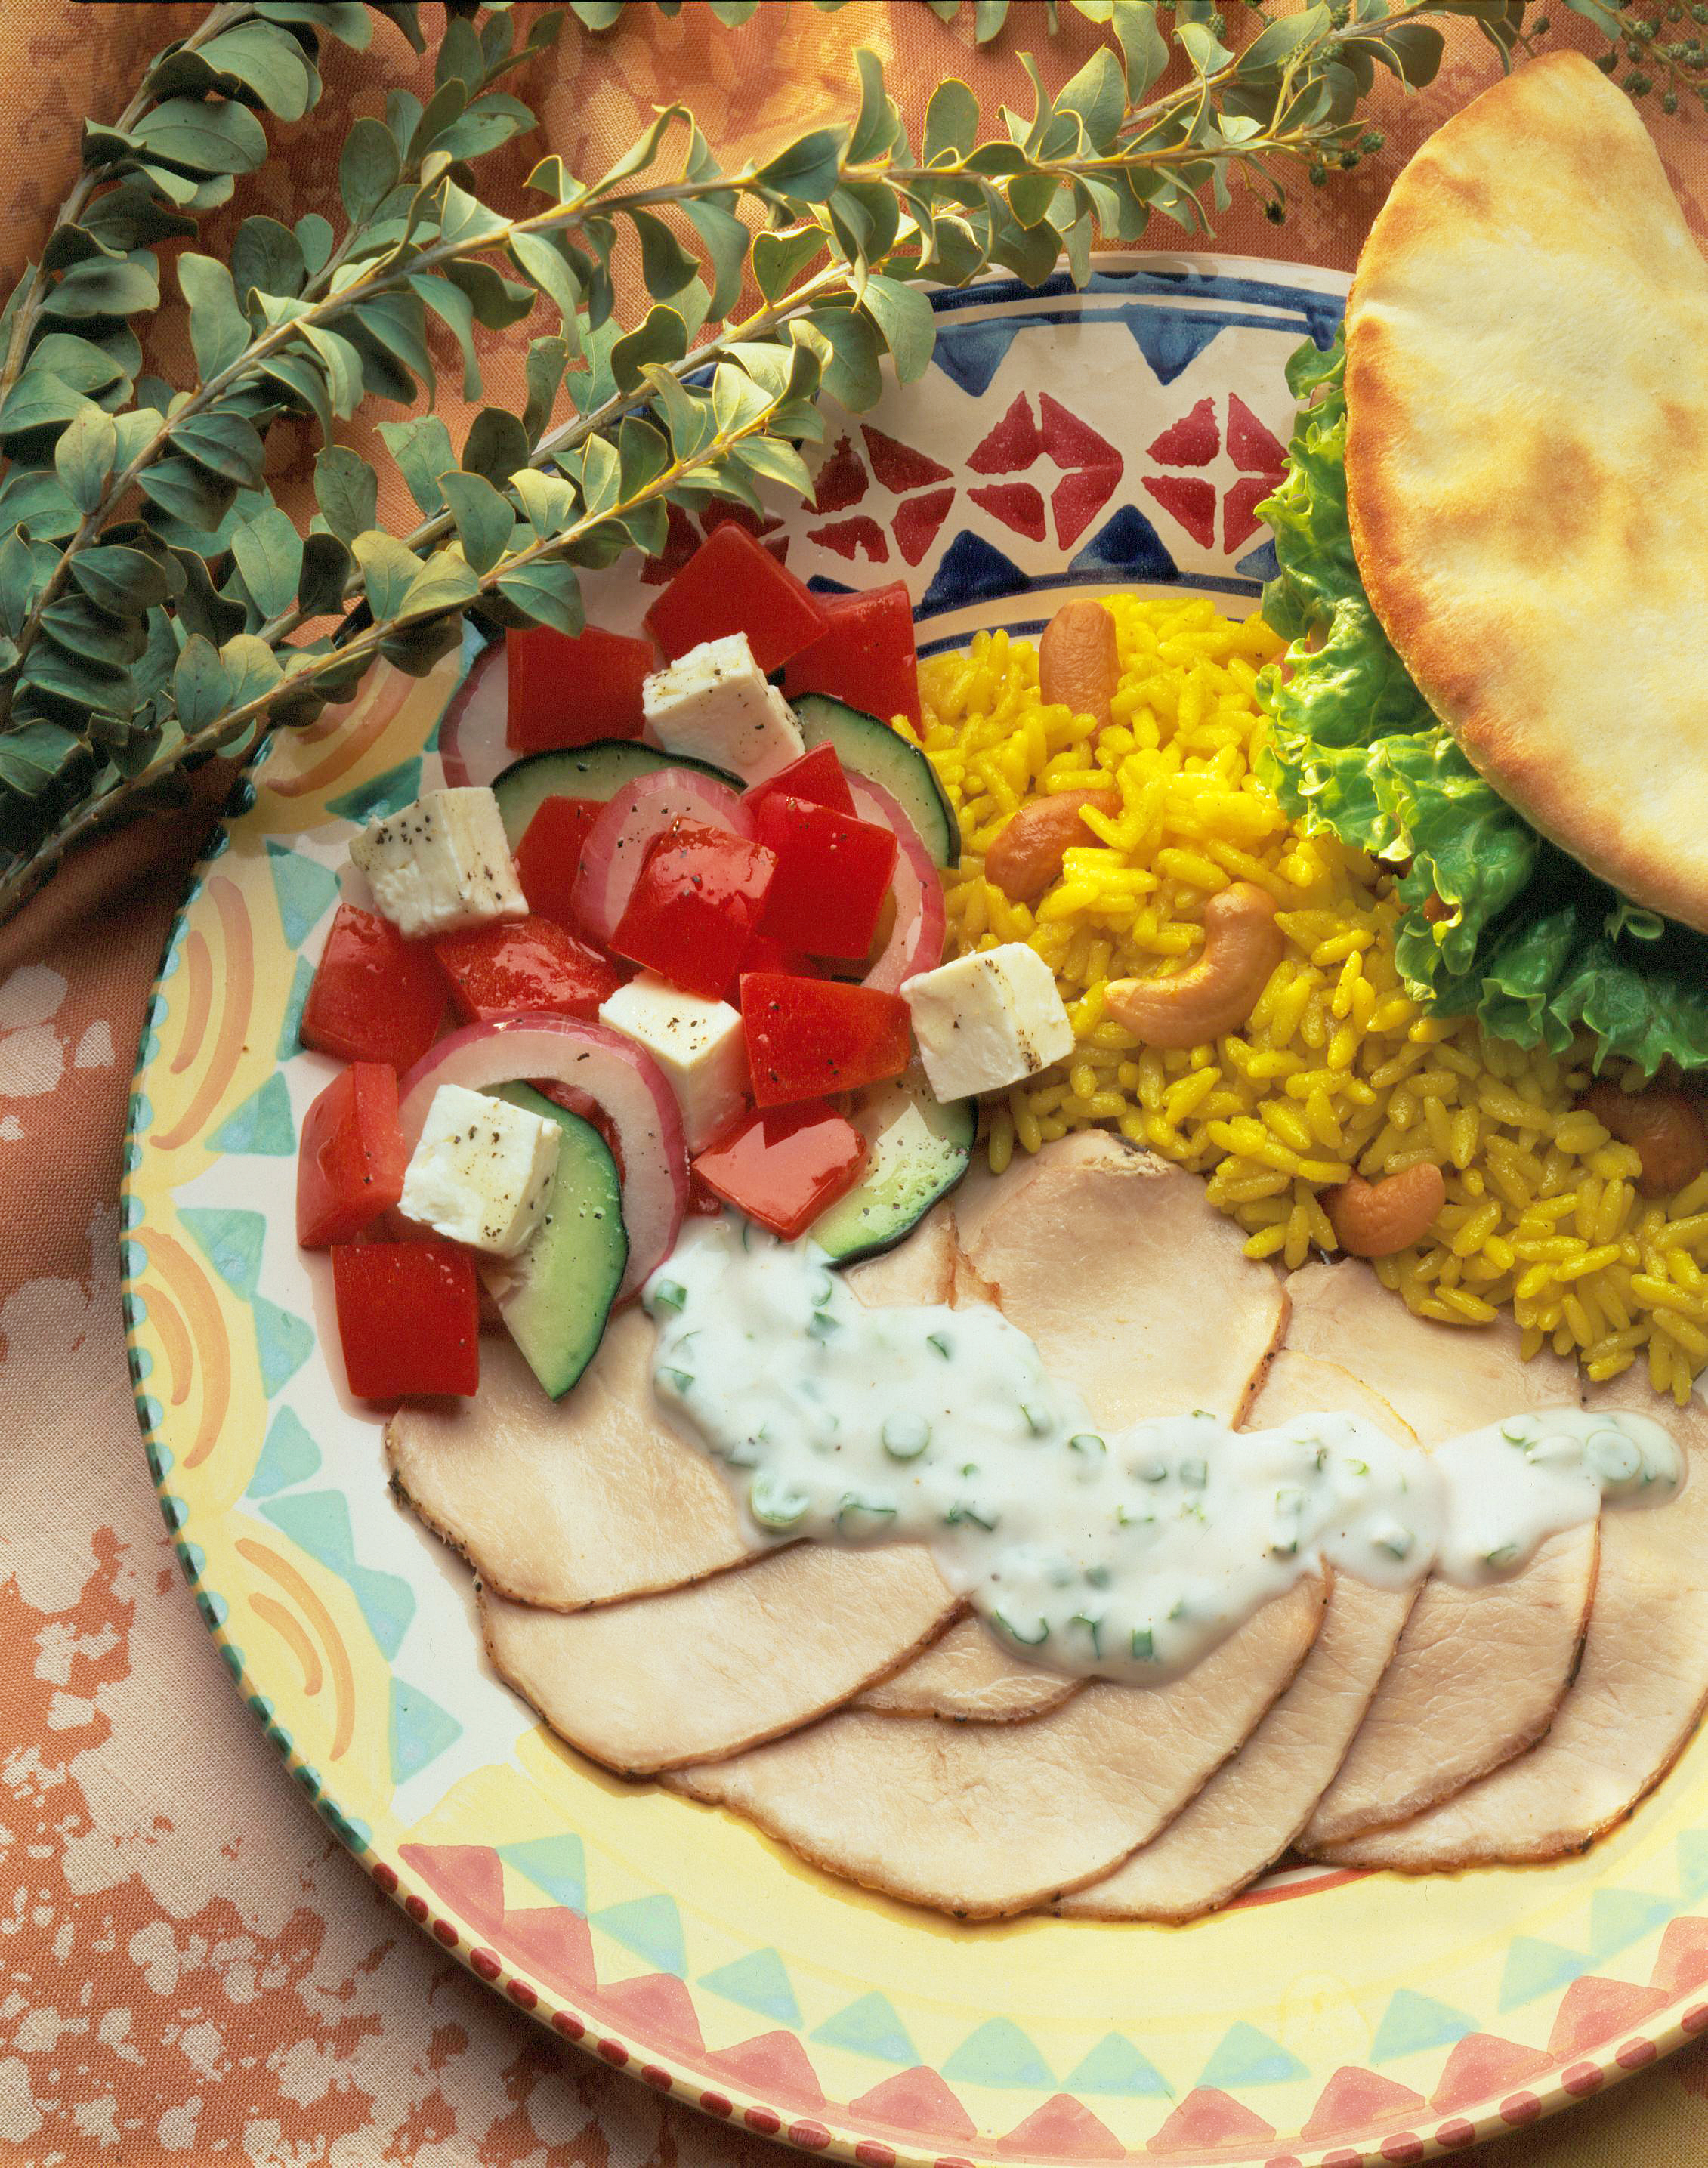 Grilled Greek Style Pork Roast With Yogurt Sauce